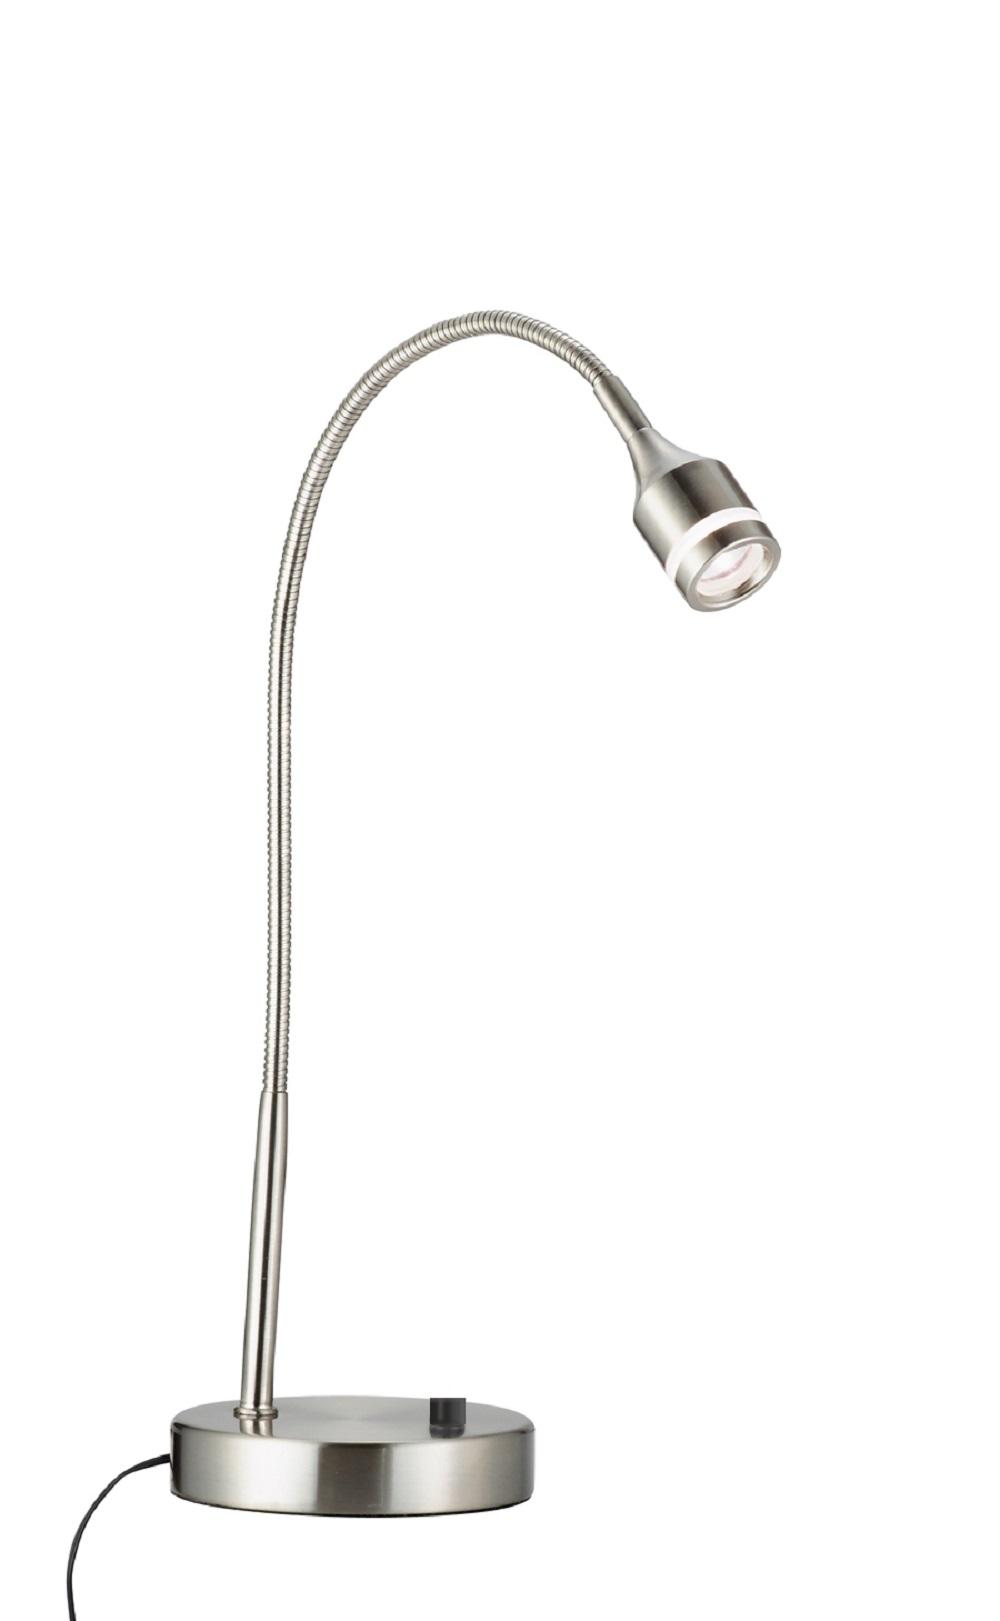 "11"" X 5-17"" X 11-18"" Brushed Steel Metal LED Desk Lamp"